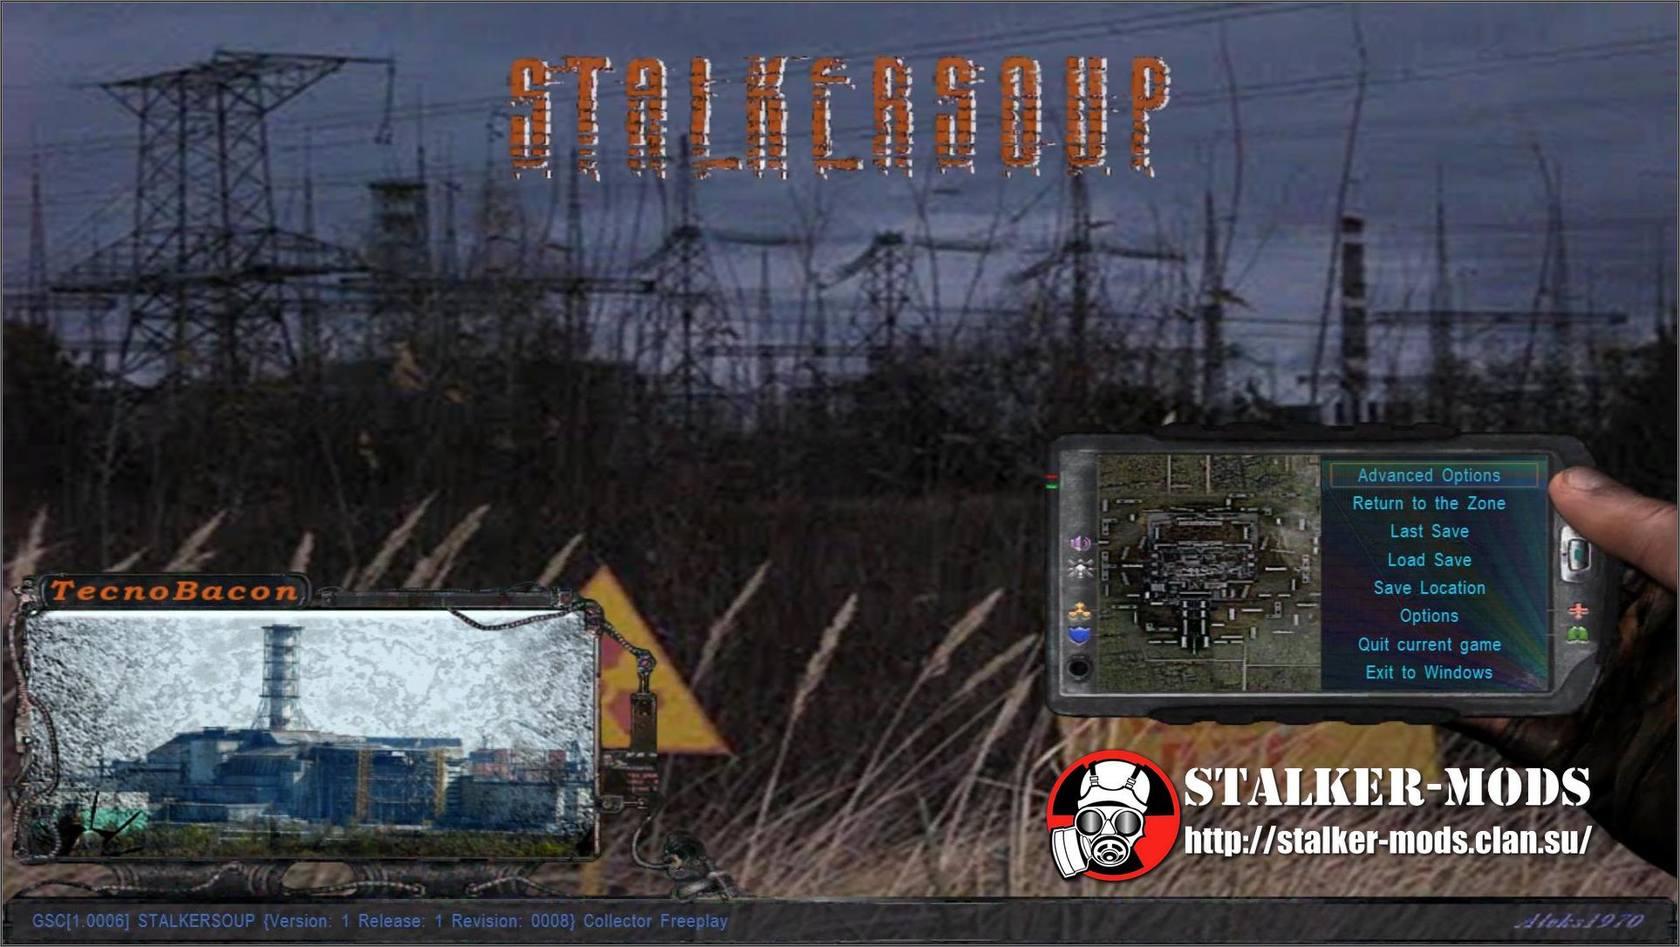 STALKERSOUP